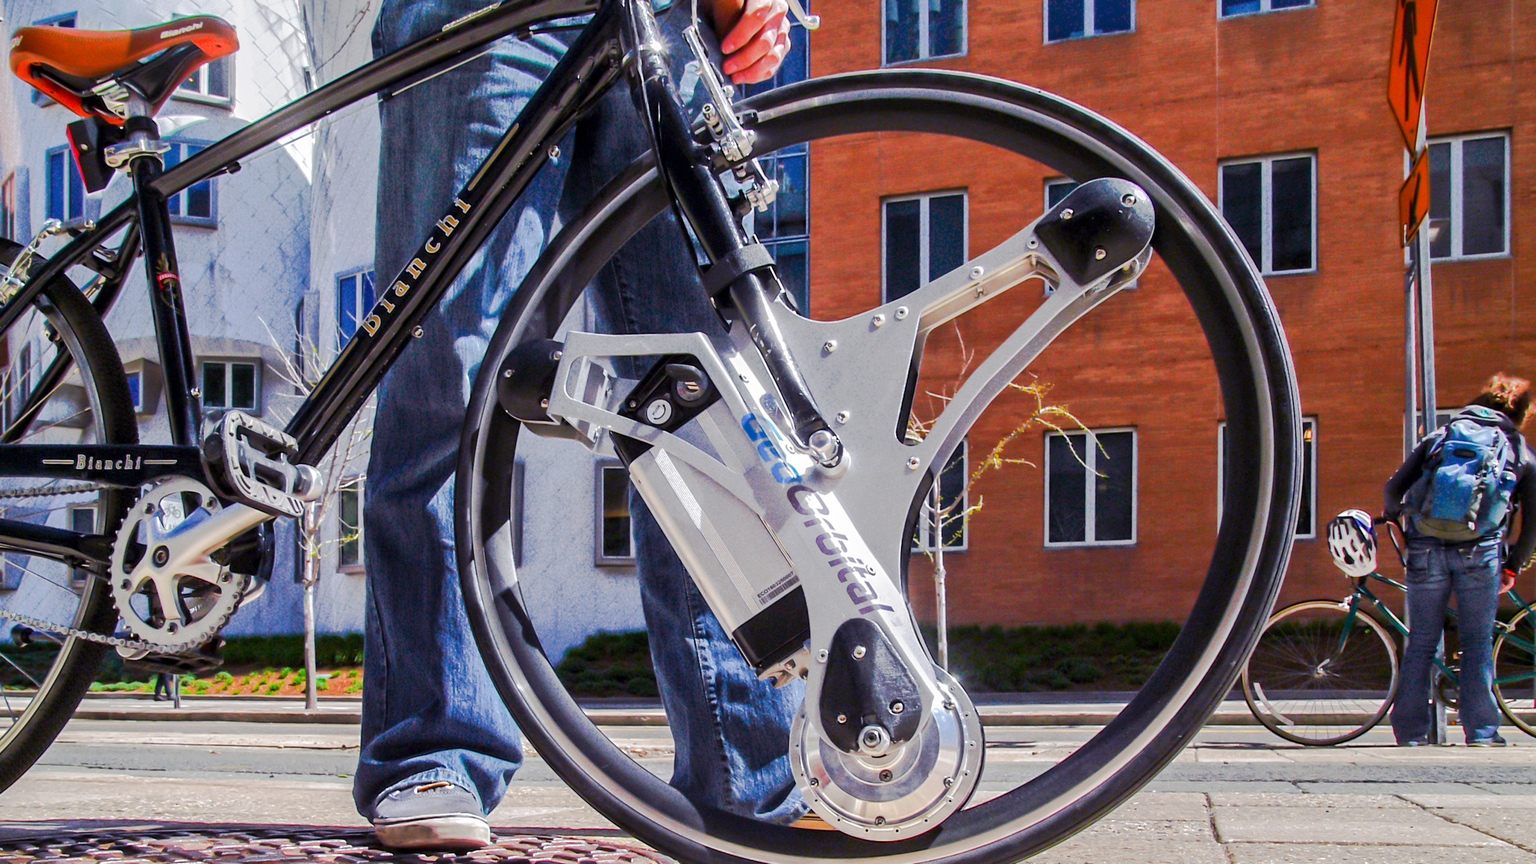 Geoorbital Wheel Tron Inspired Add On Makes Any Bike